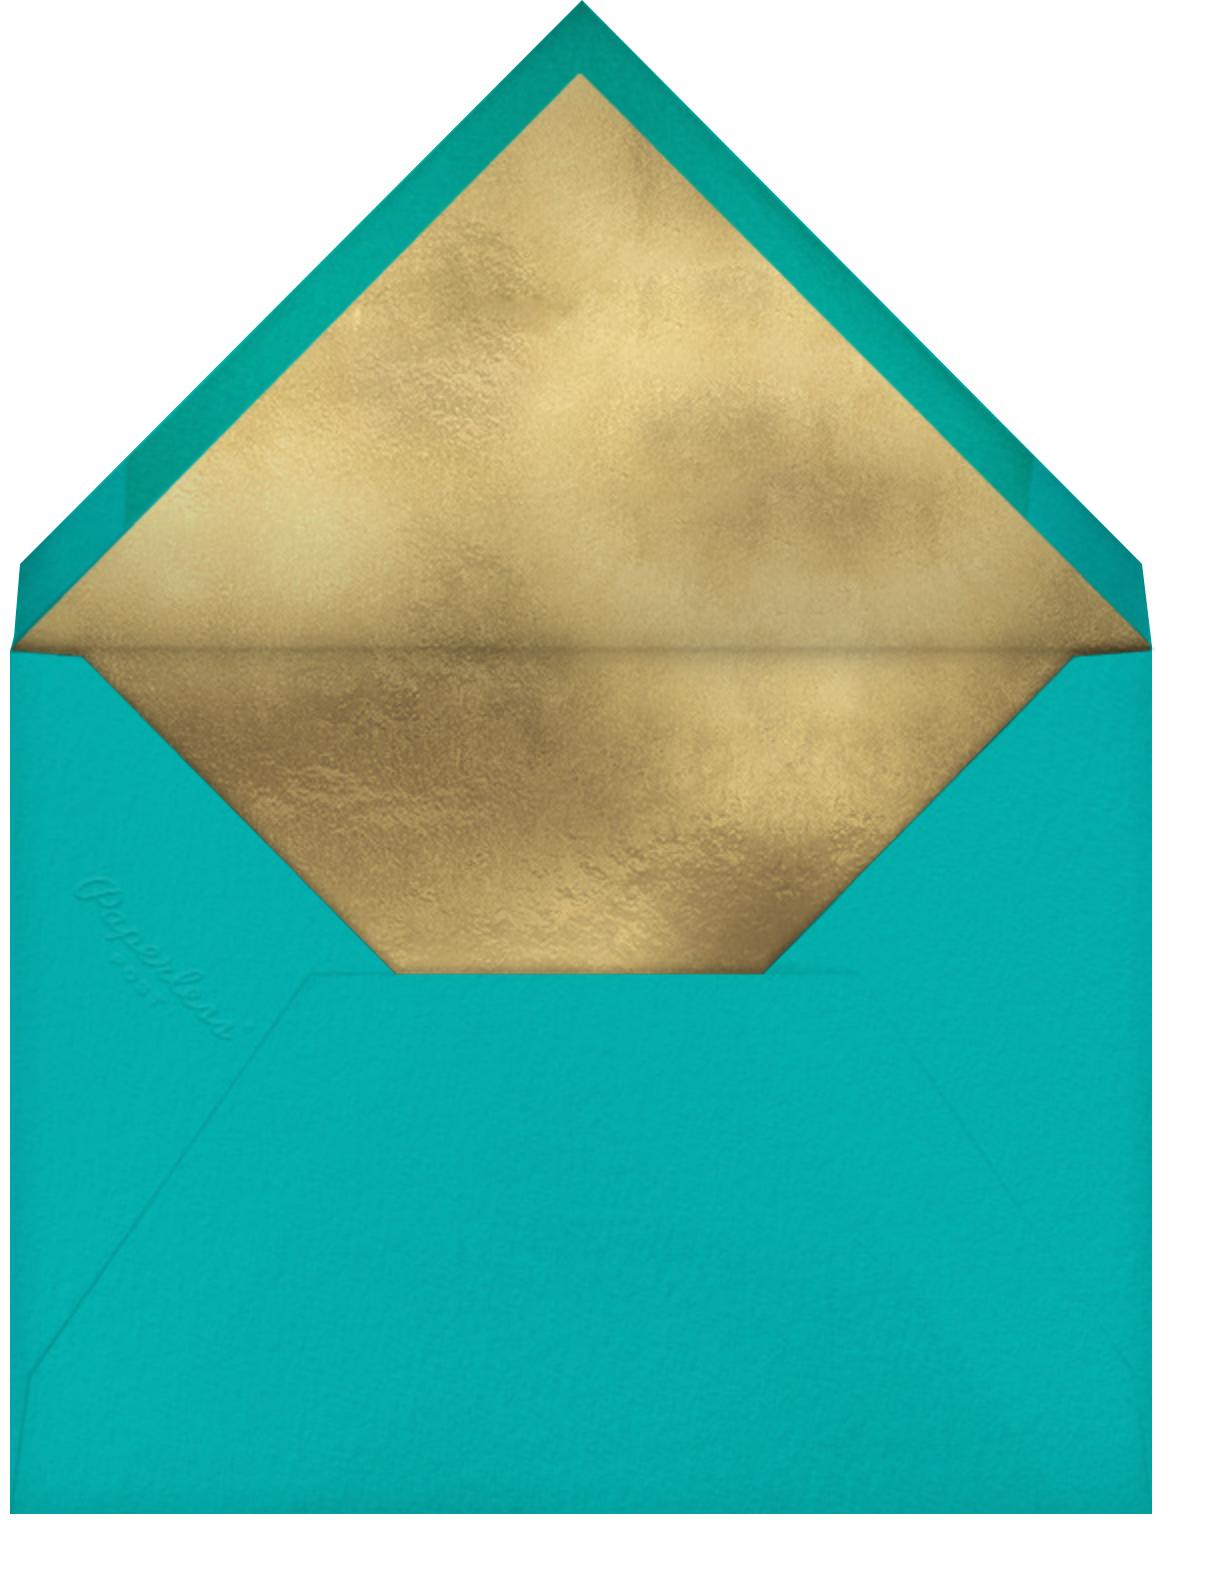 Peacocking - Teal - Jonathan Adler - General entertaining - envelope back